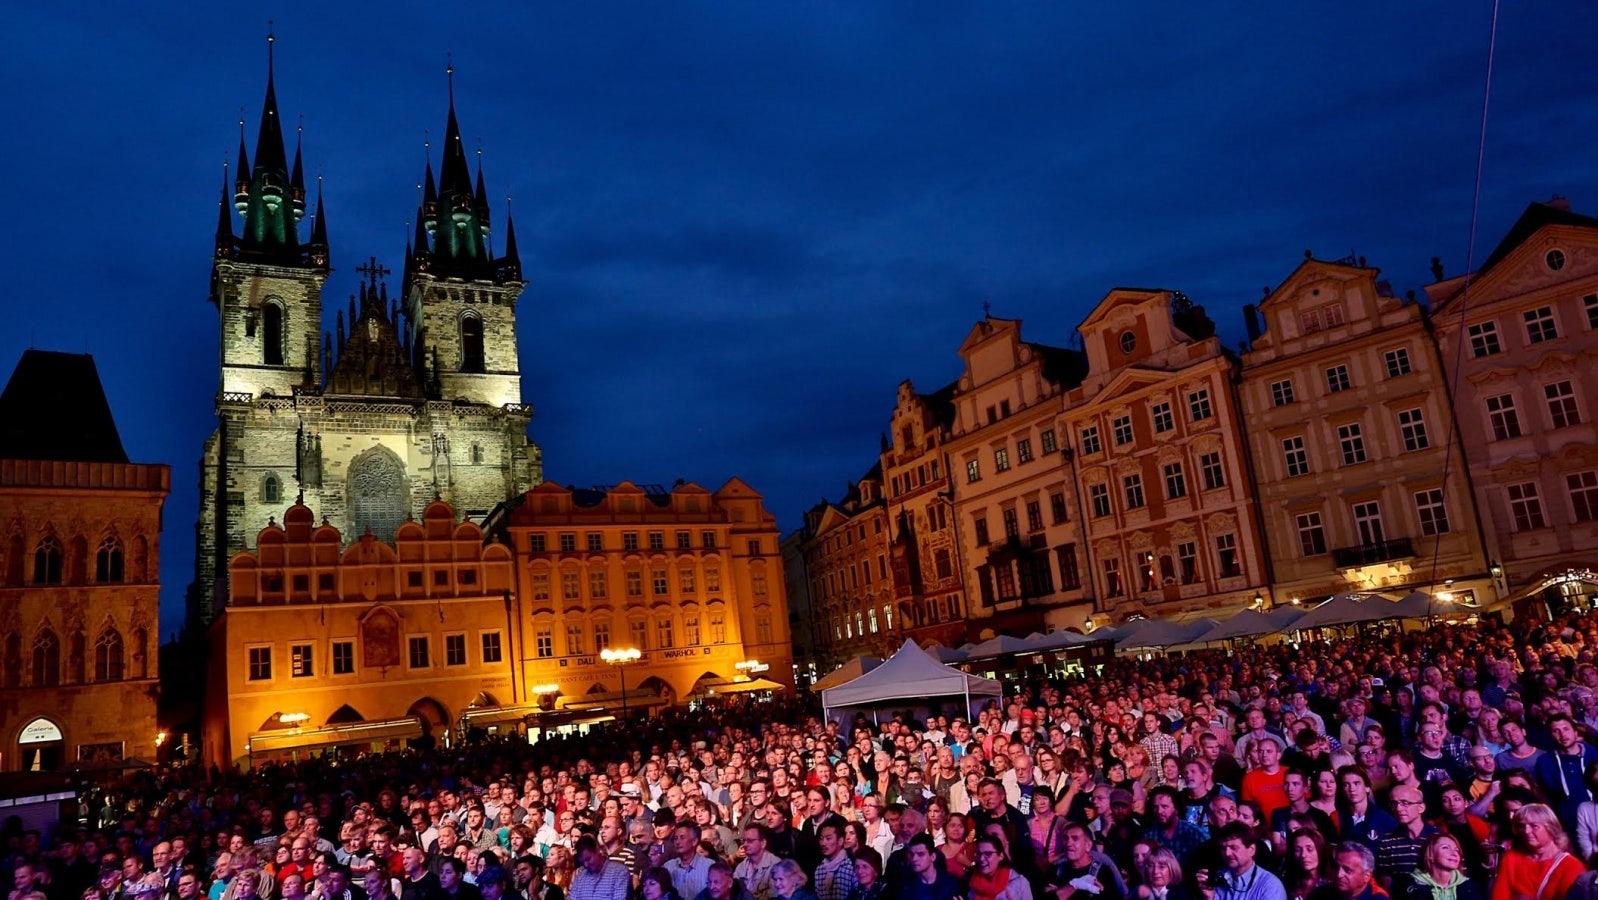 Prague - Bohemia Jazz Fest crowd on Old Town Square